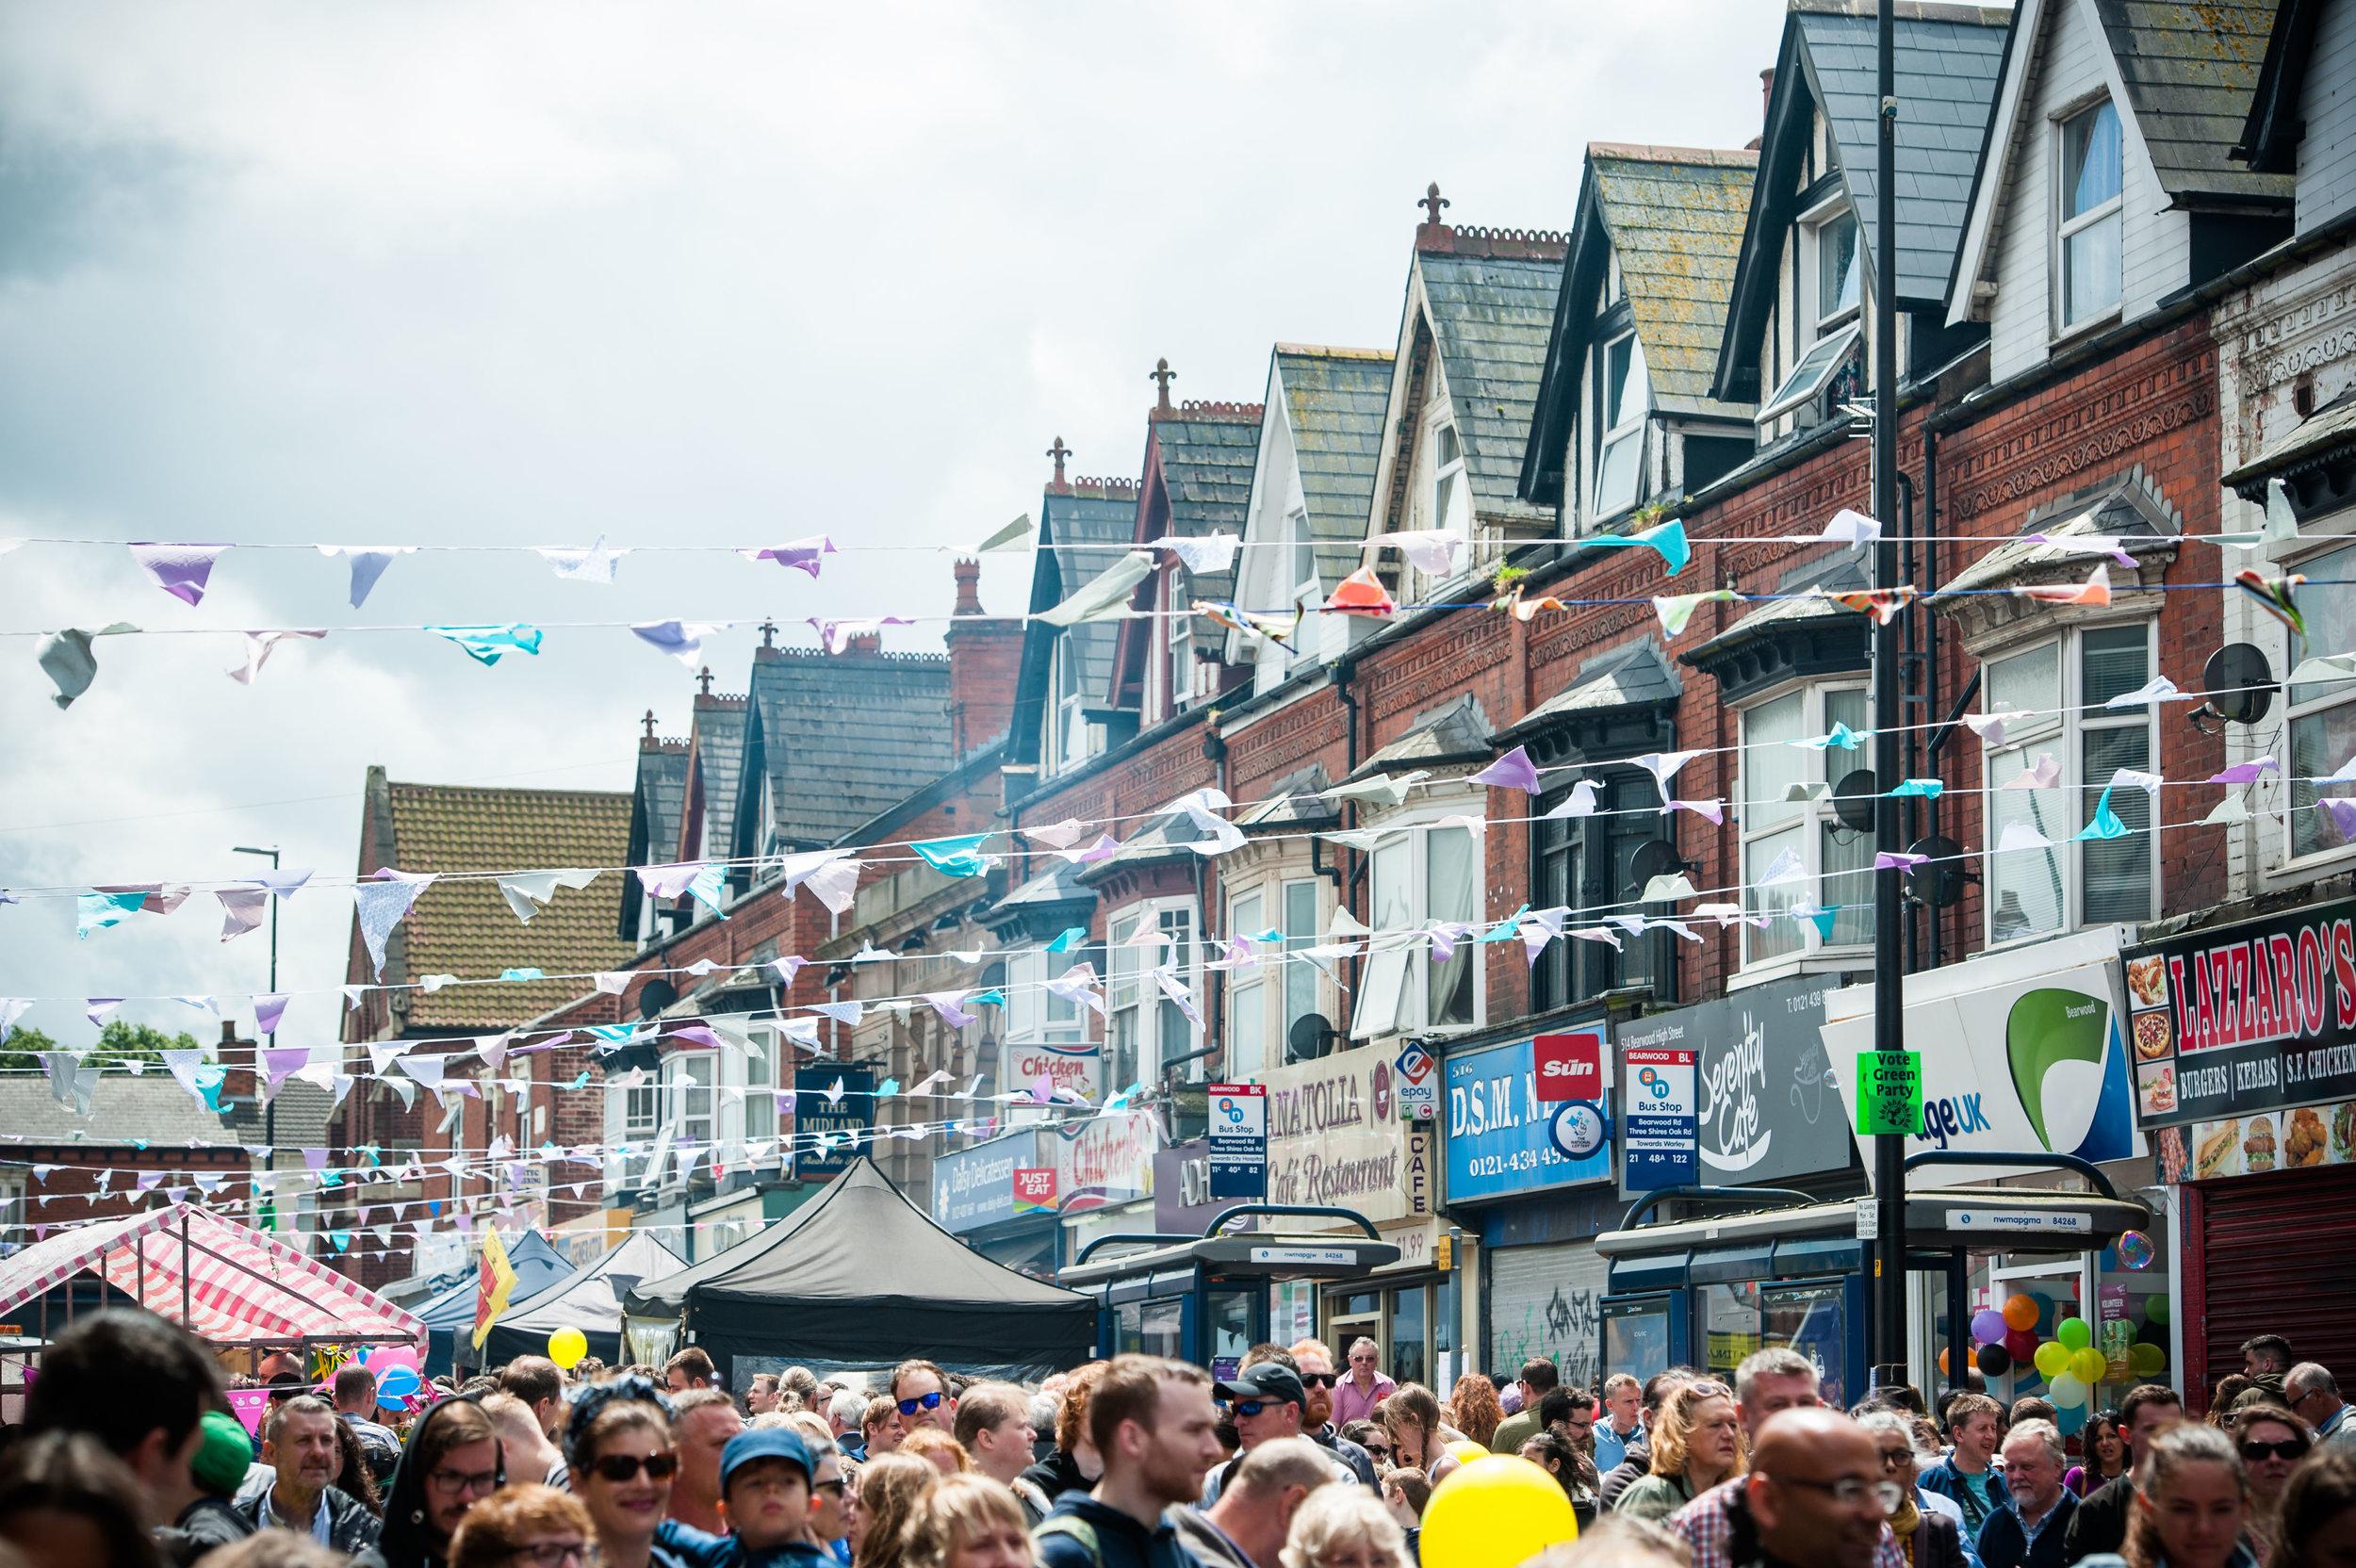 Bearwood Street Festival